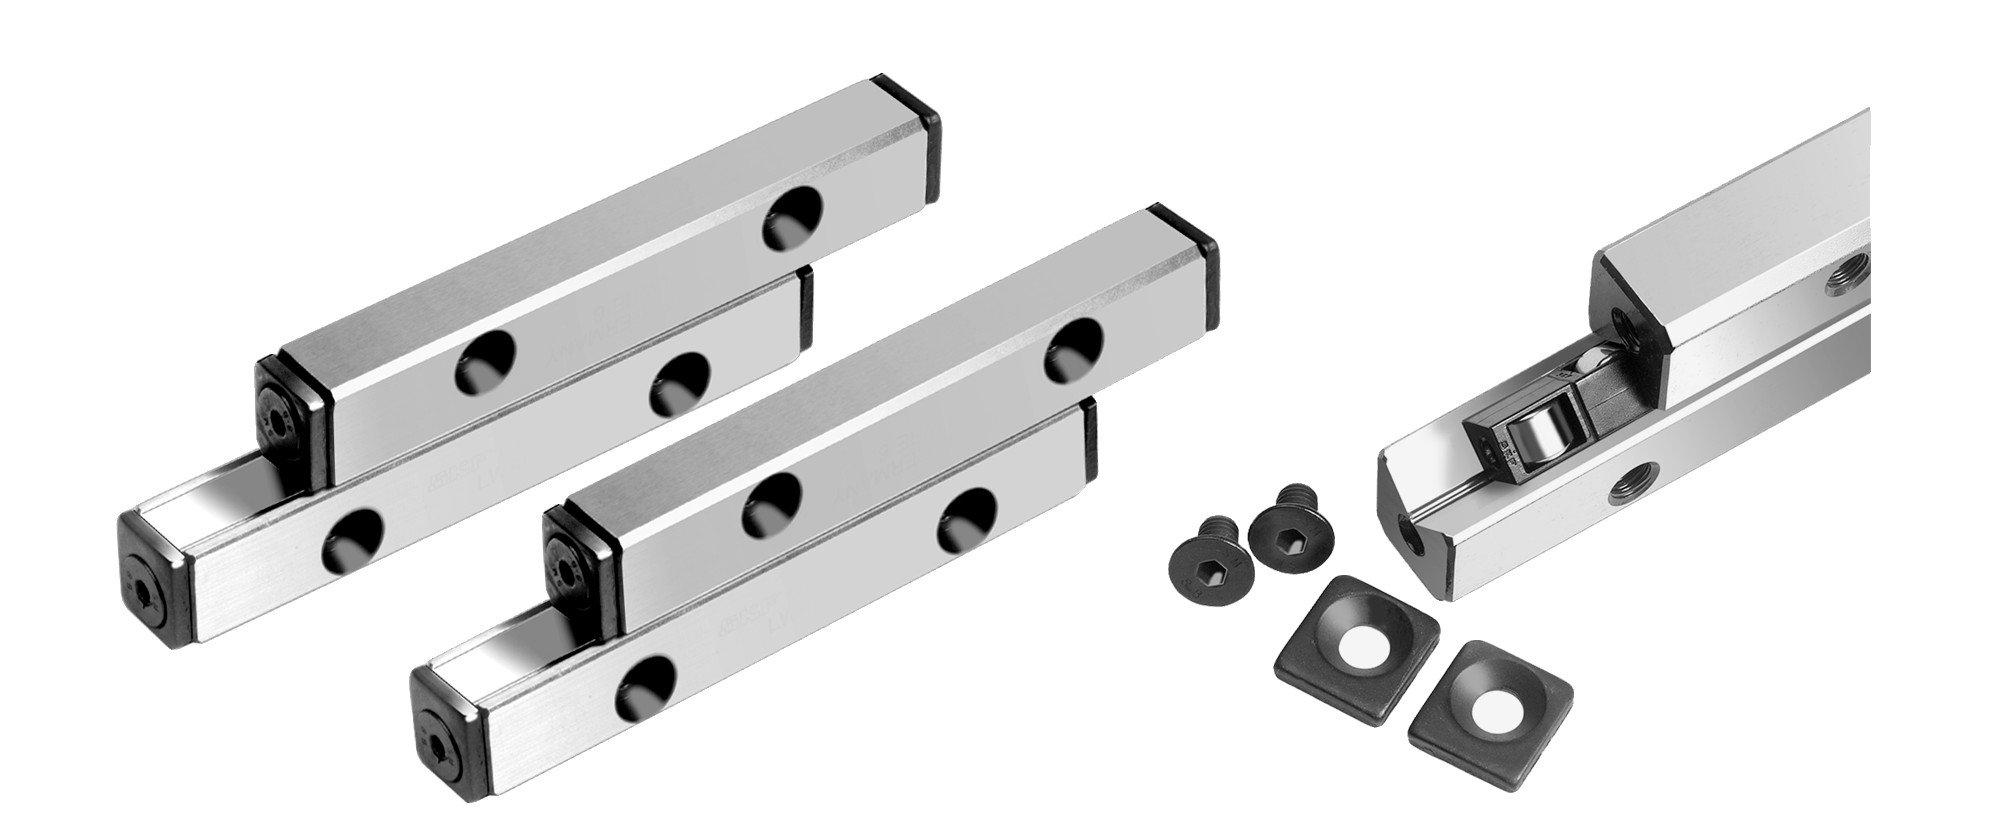 Precision rail guiding RE-ACS size 3 18x8x75mm travel 30mm by Maedler